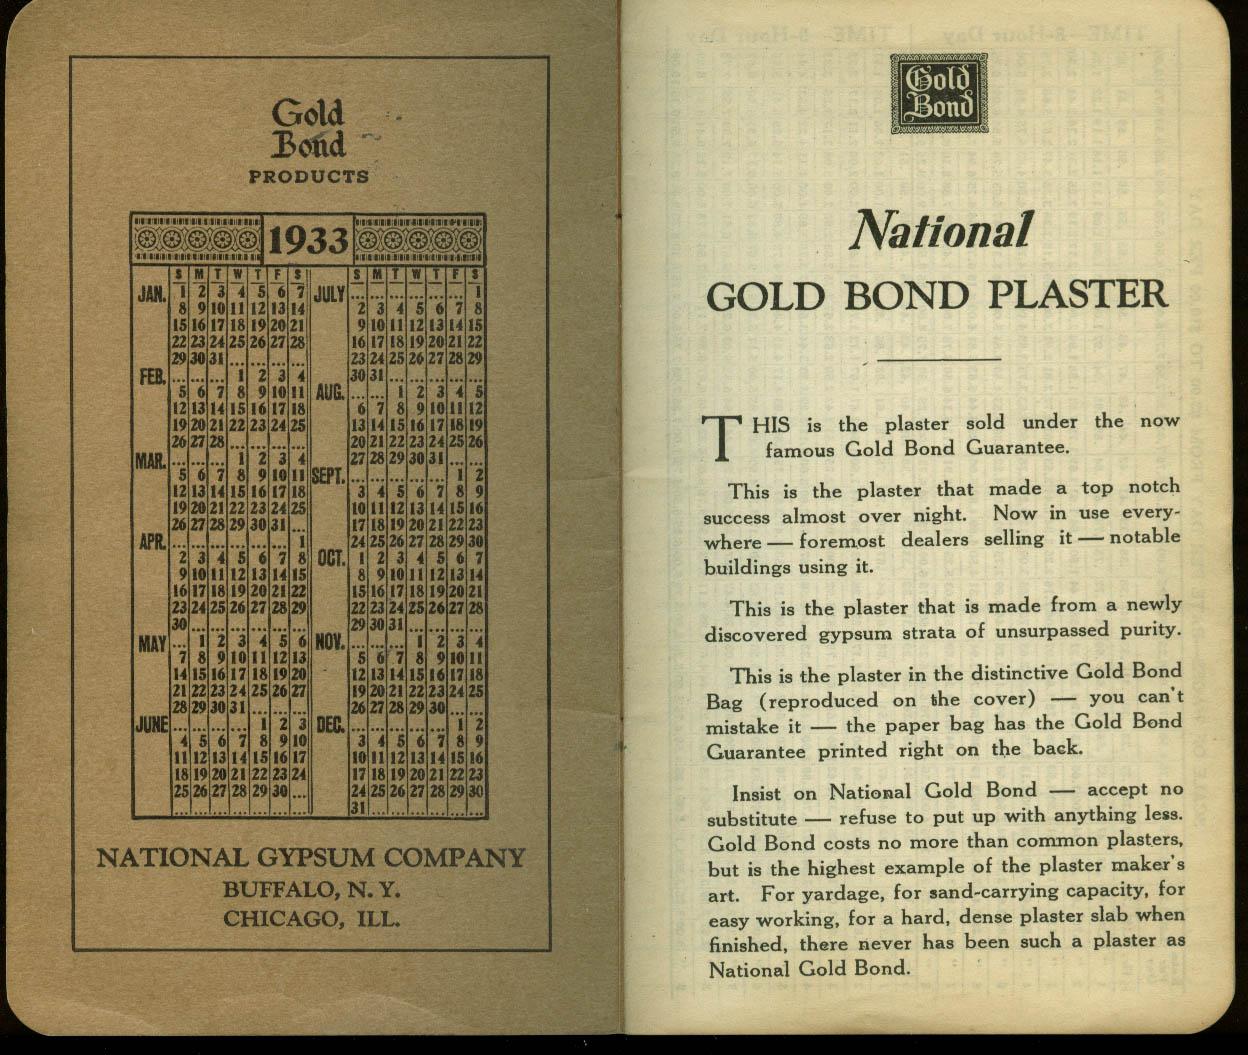 National Gold Bond Plaster Time Book 1933 1934